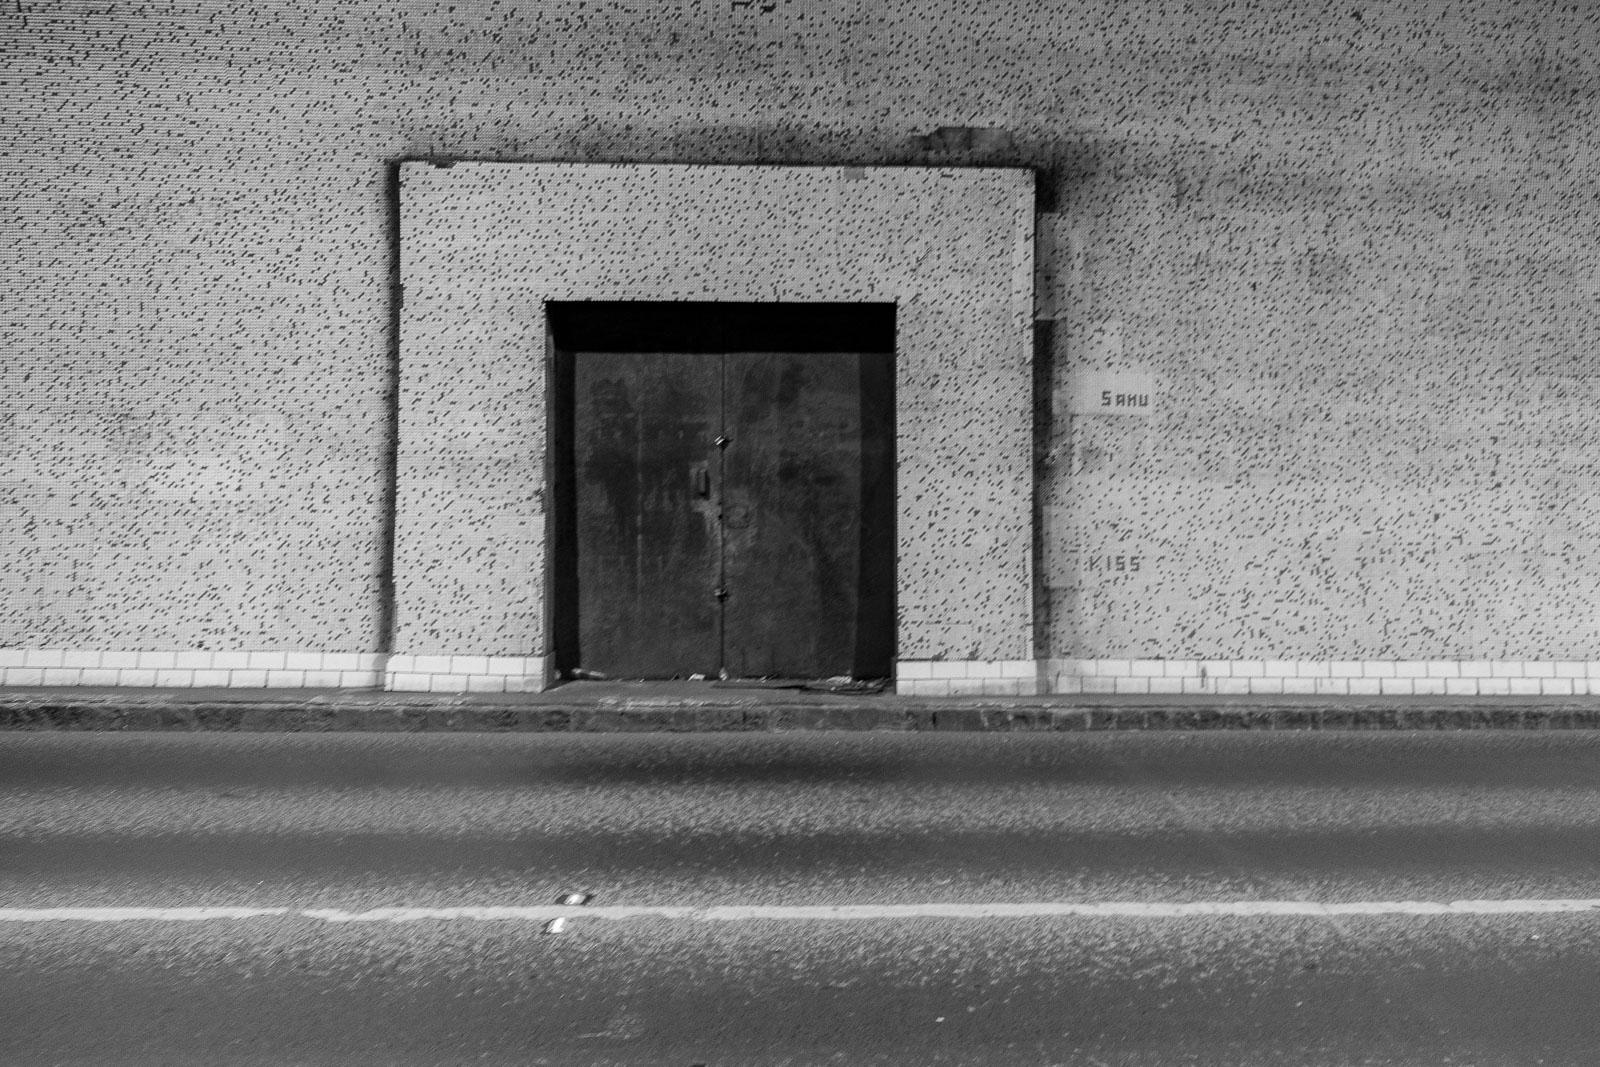 budapest-30.jpg